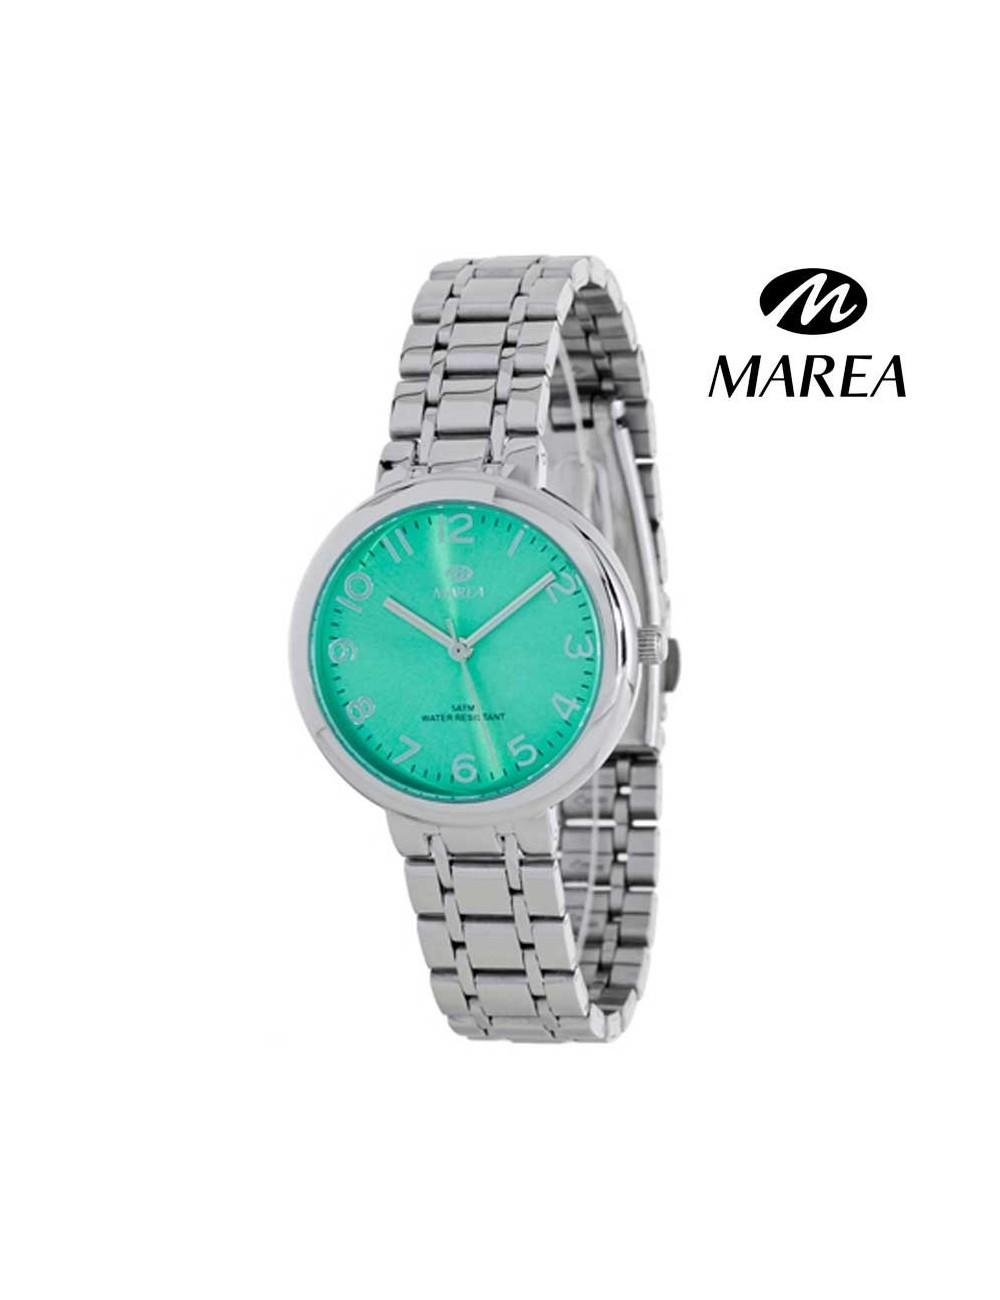 zapatos deportivos 3a64c 2d0ce Reloj Marea mujer cadena B41190-5 verde